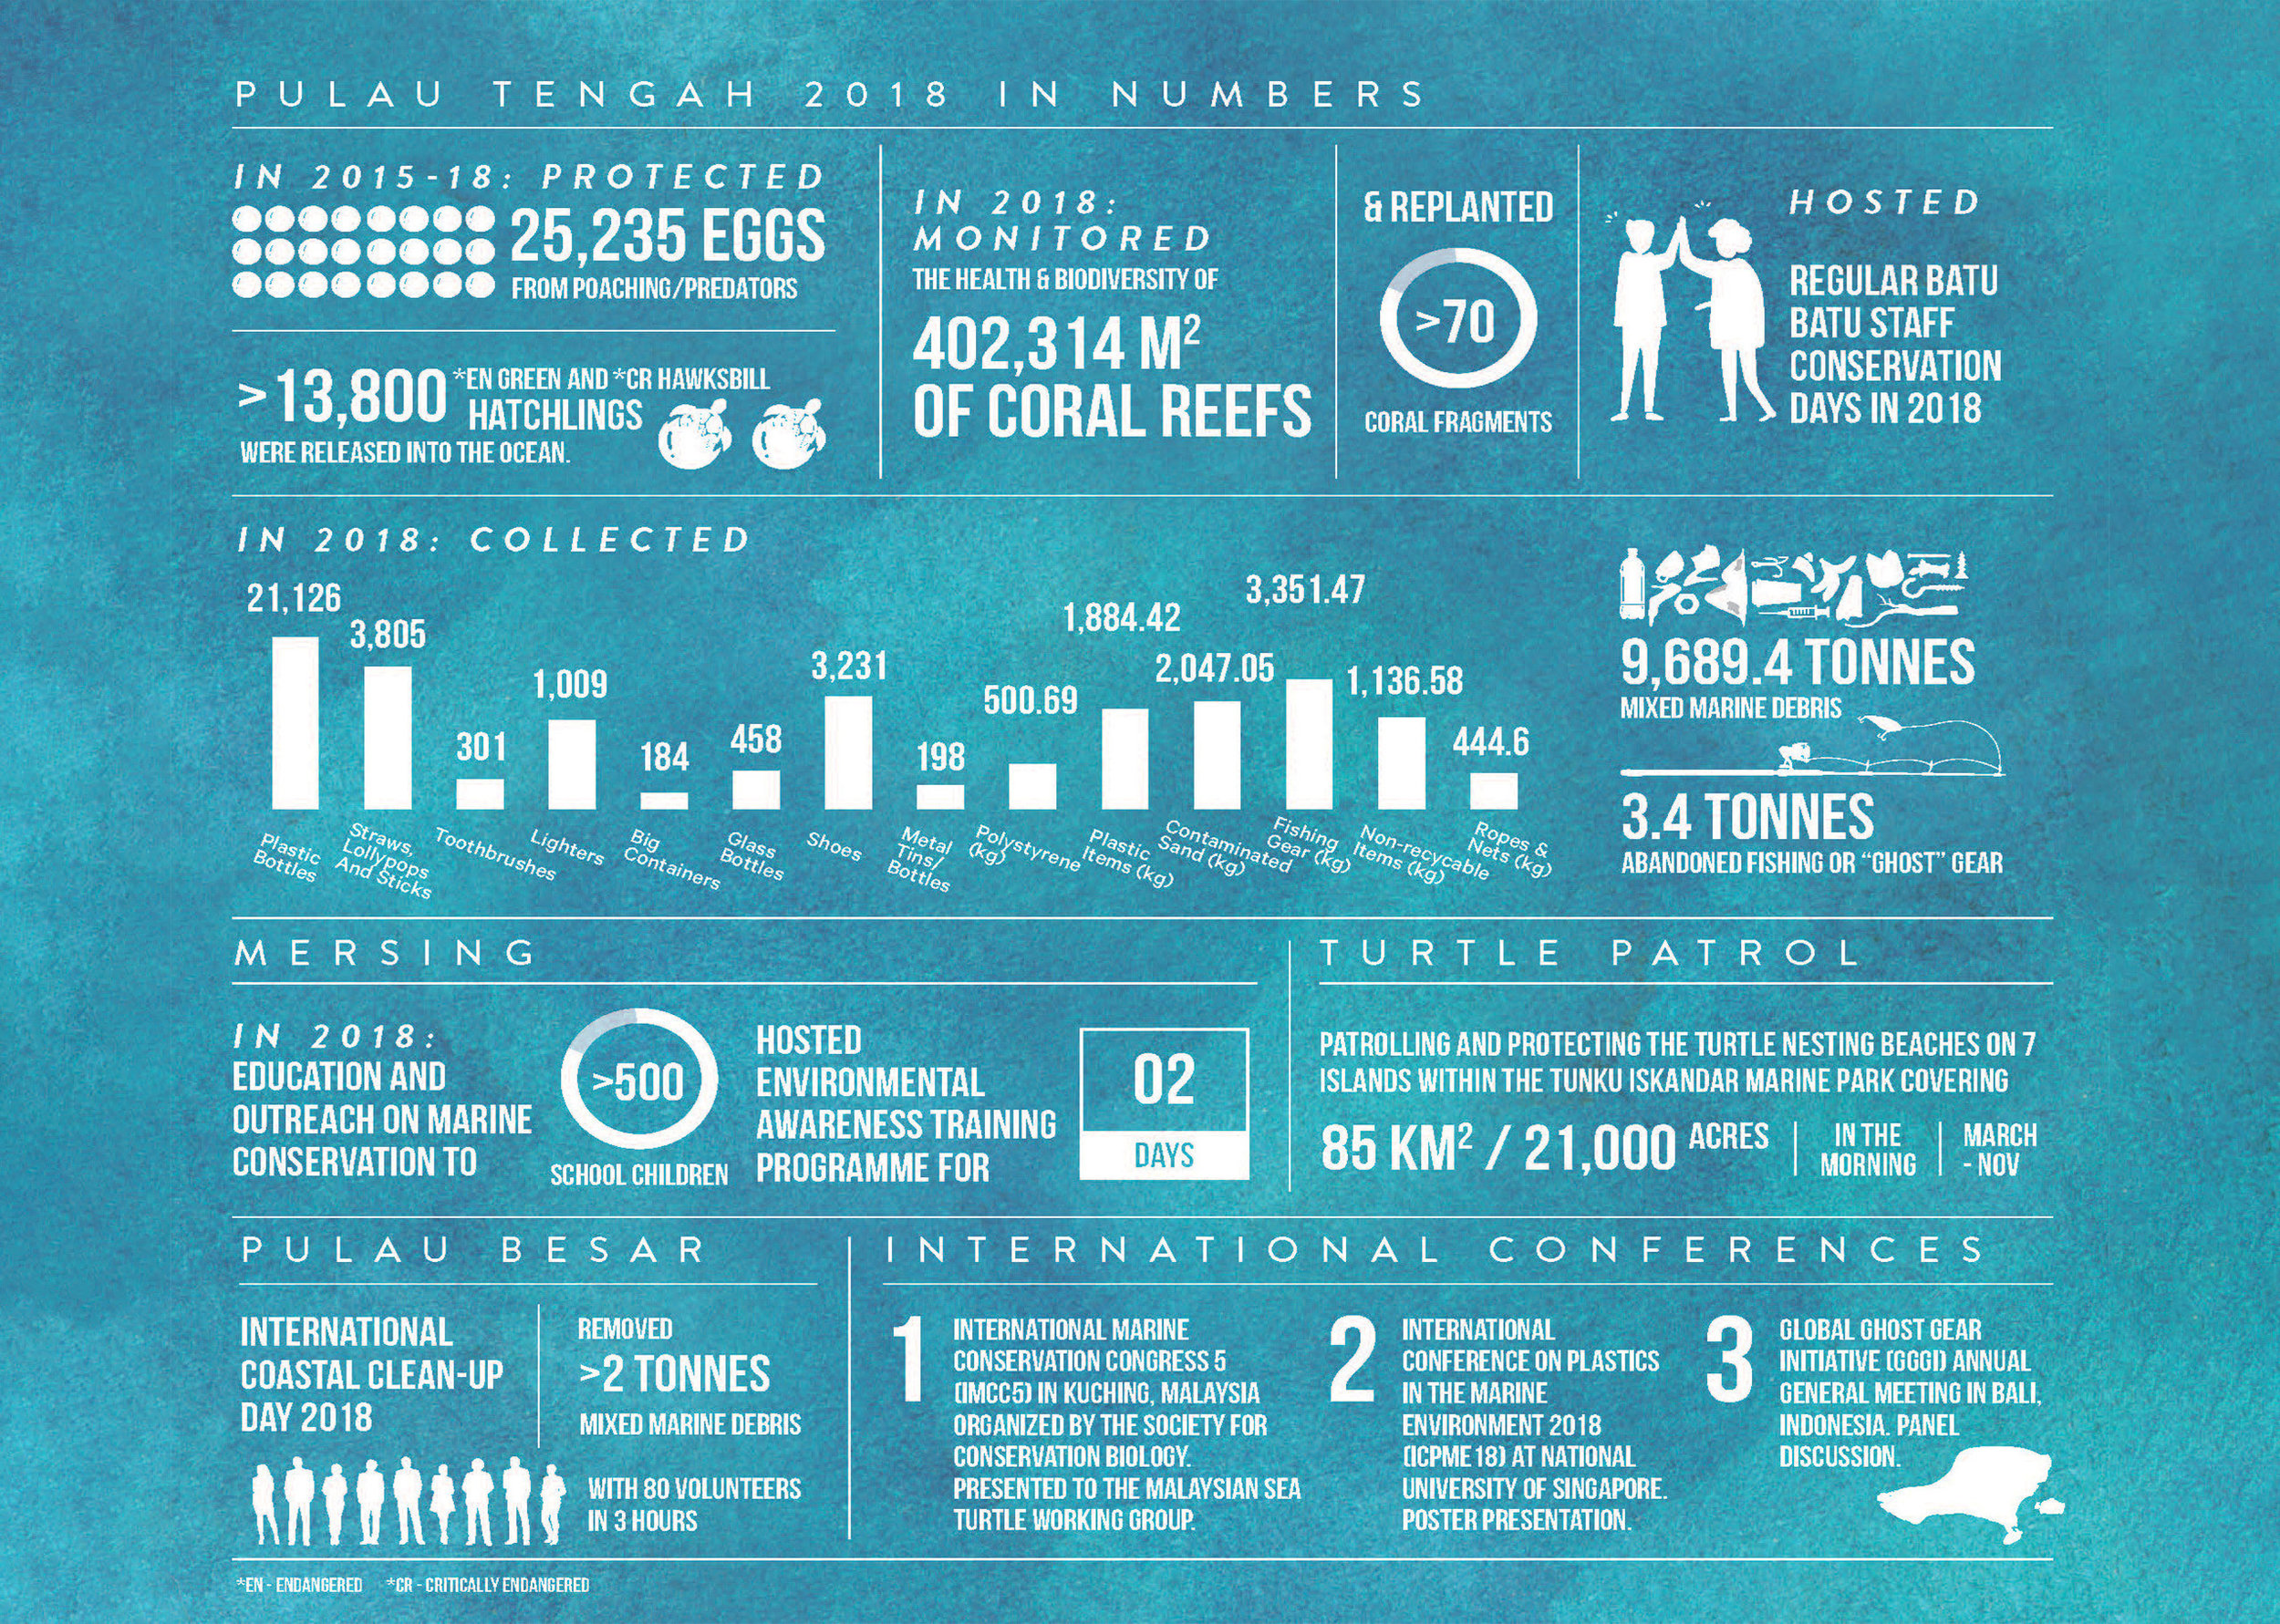 Palau Tengah 2018 in Numbers